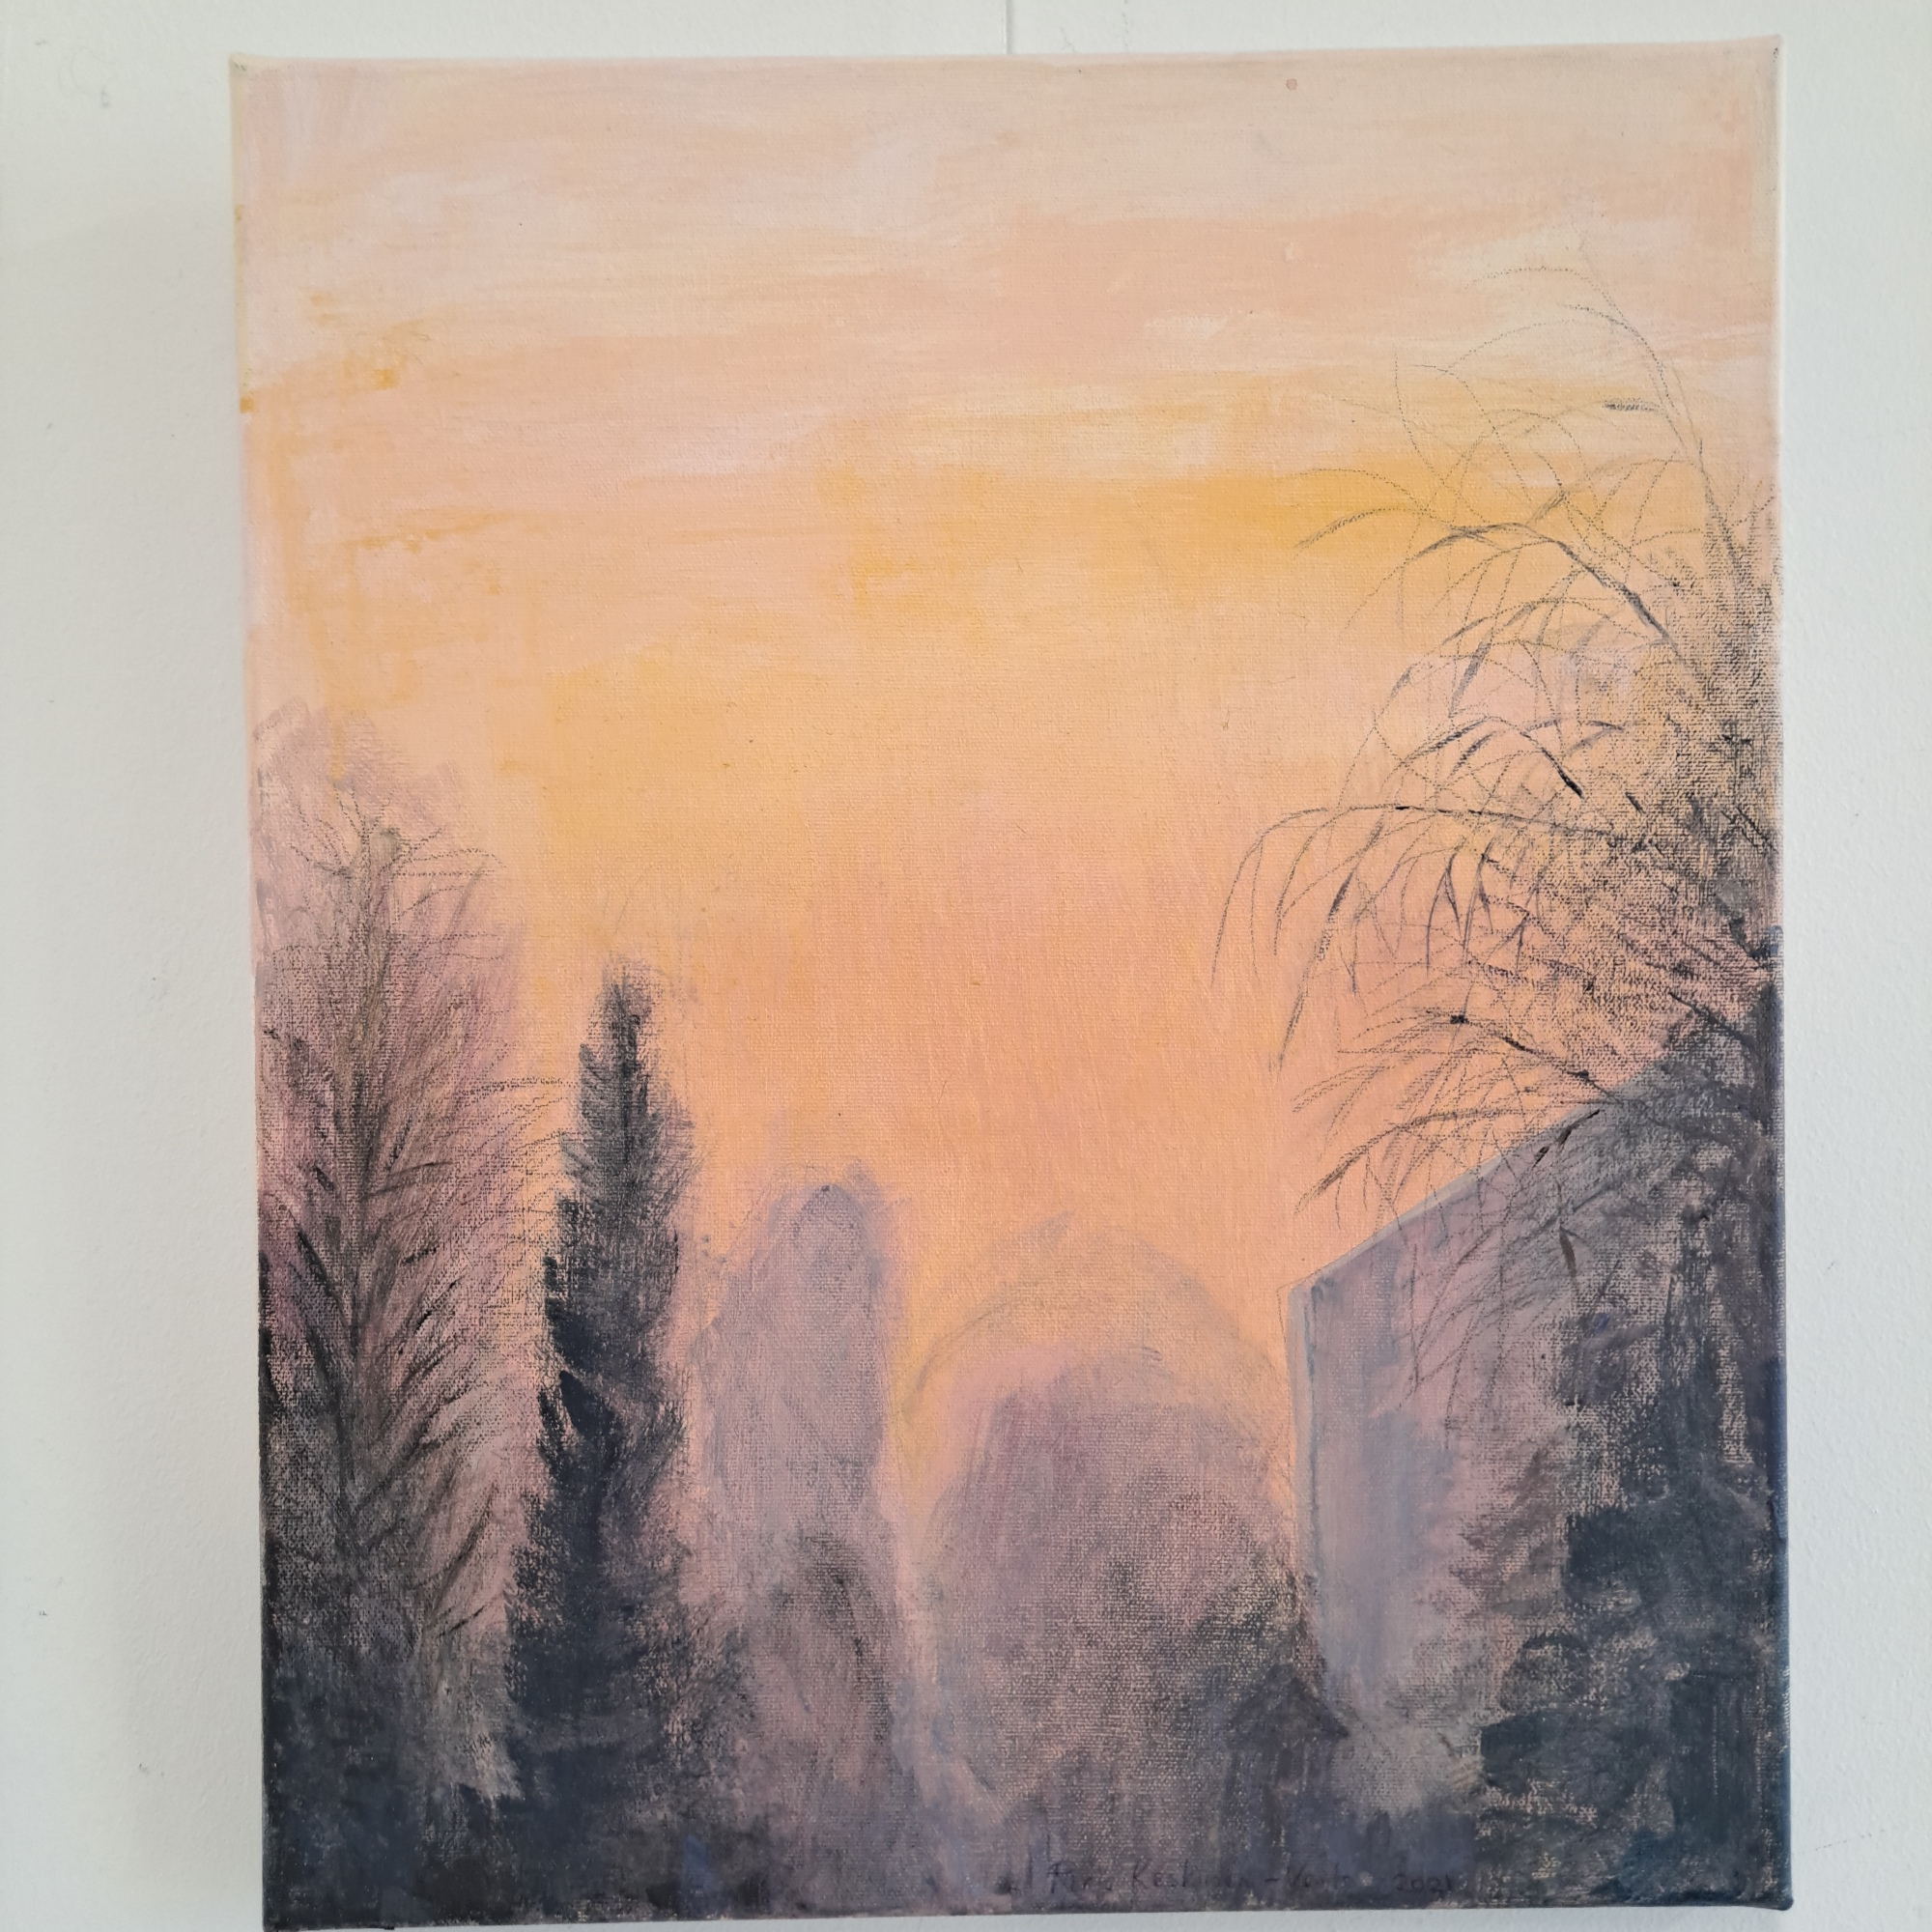 maalaus taide akryyli paperihuone